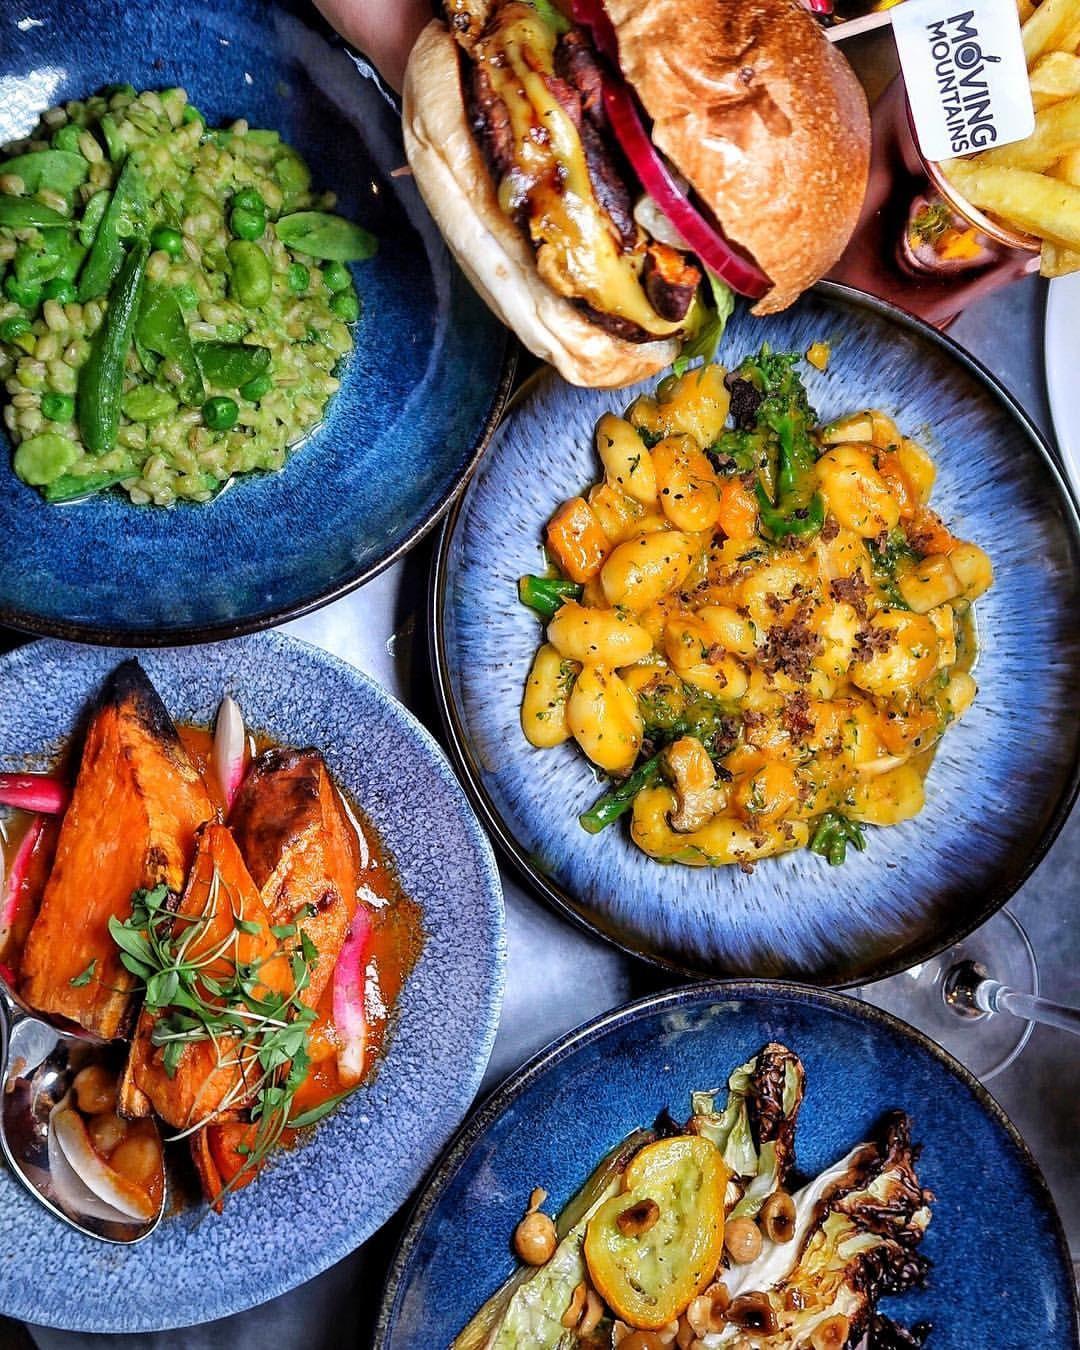 1 026 Likes 82 Comments Vegan Food London Thelittlelondonvegan On Instagram Usually A Traditional Brasserie Men Food Vegan Recipes Vegan London